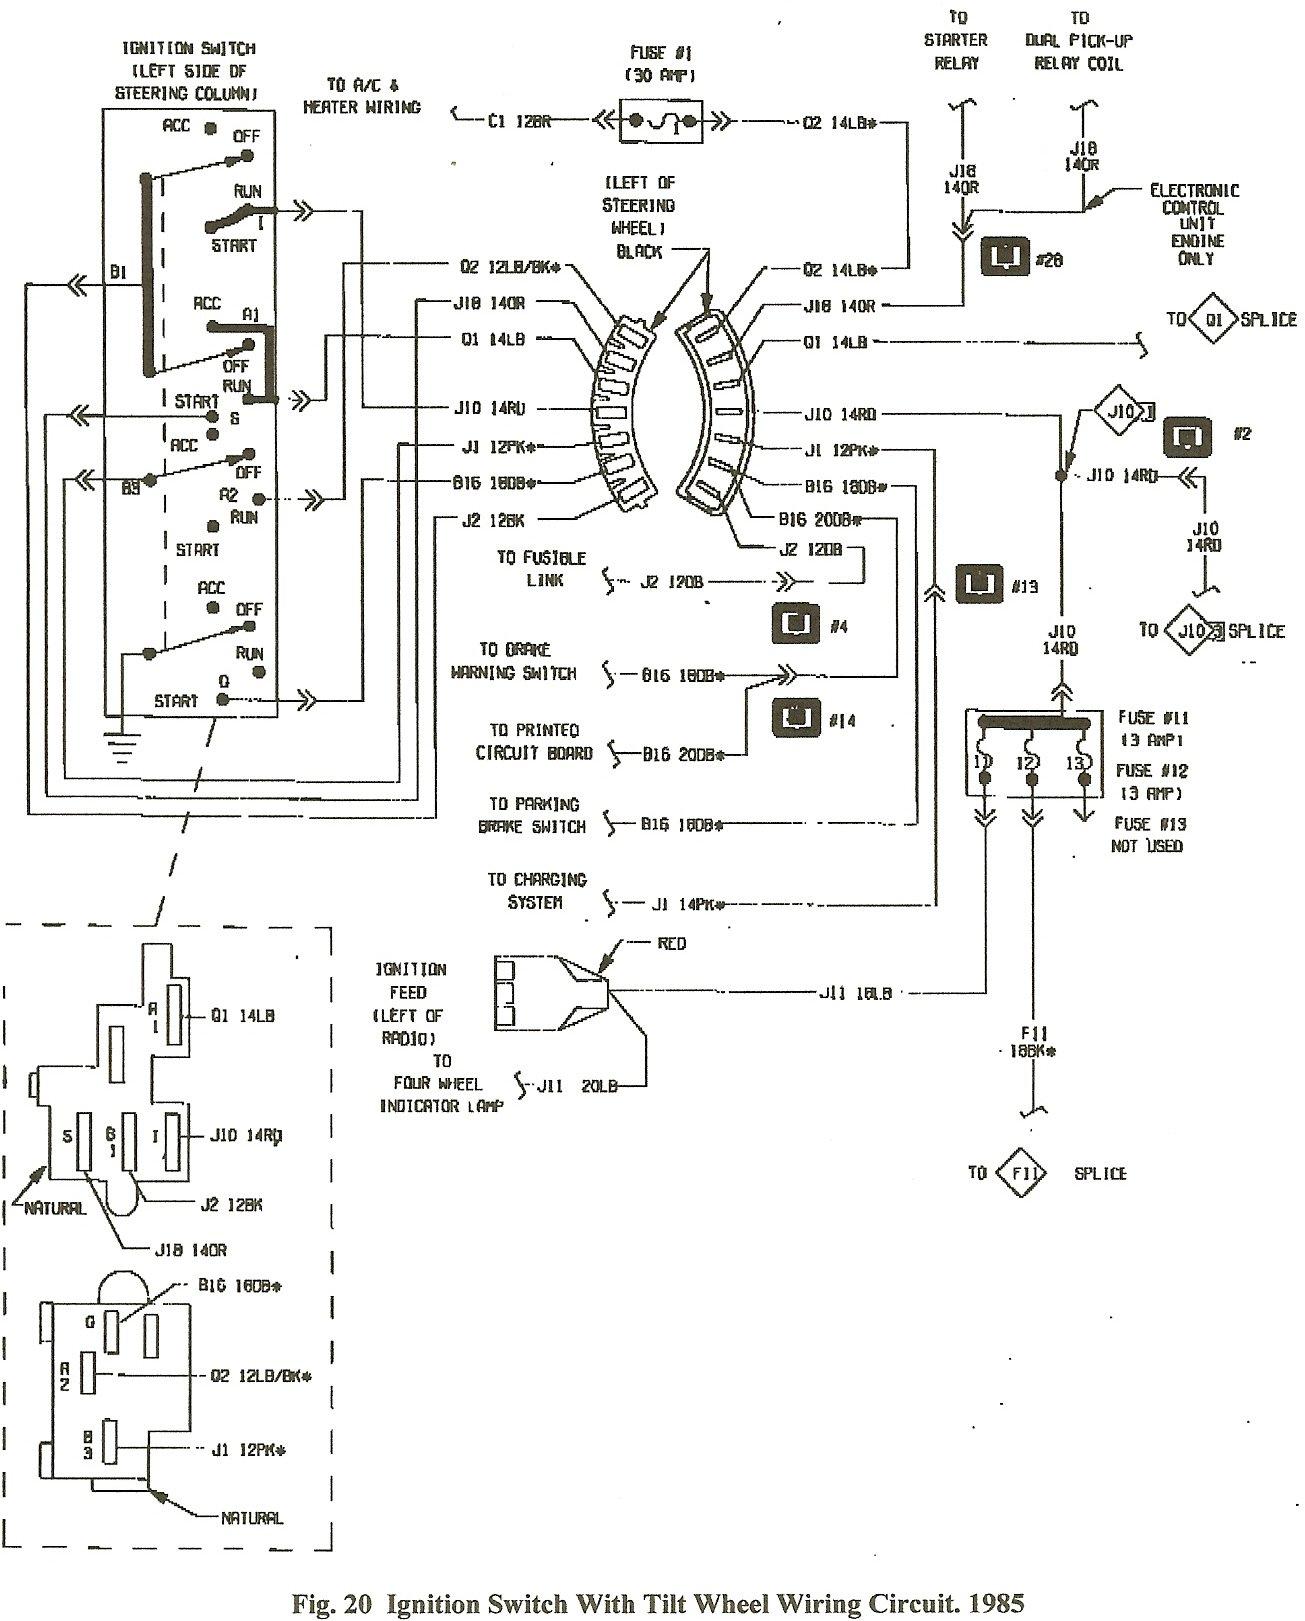 Fog Light Wiring Harness 1998 Dodge Ram 1500 | Wiring Library - Dodge Ram Wiring Harness Diagram